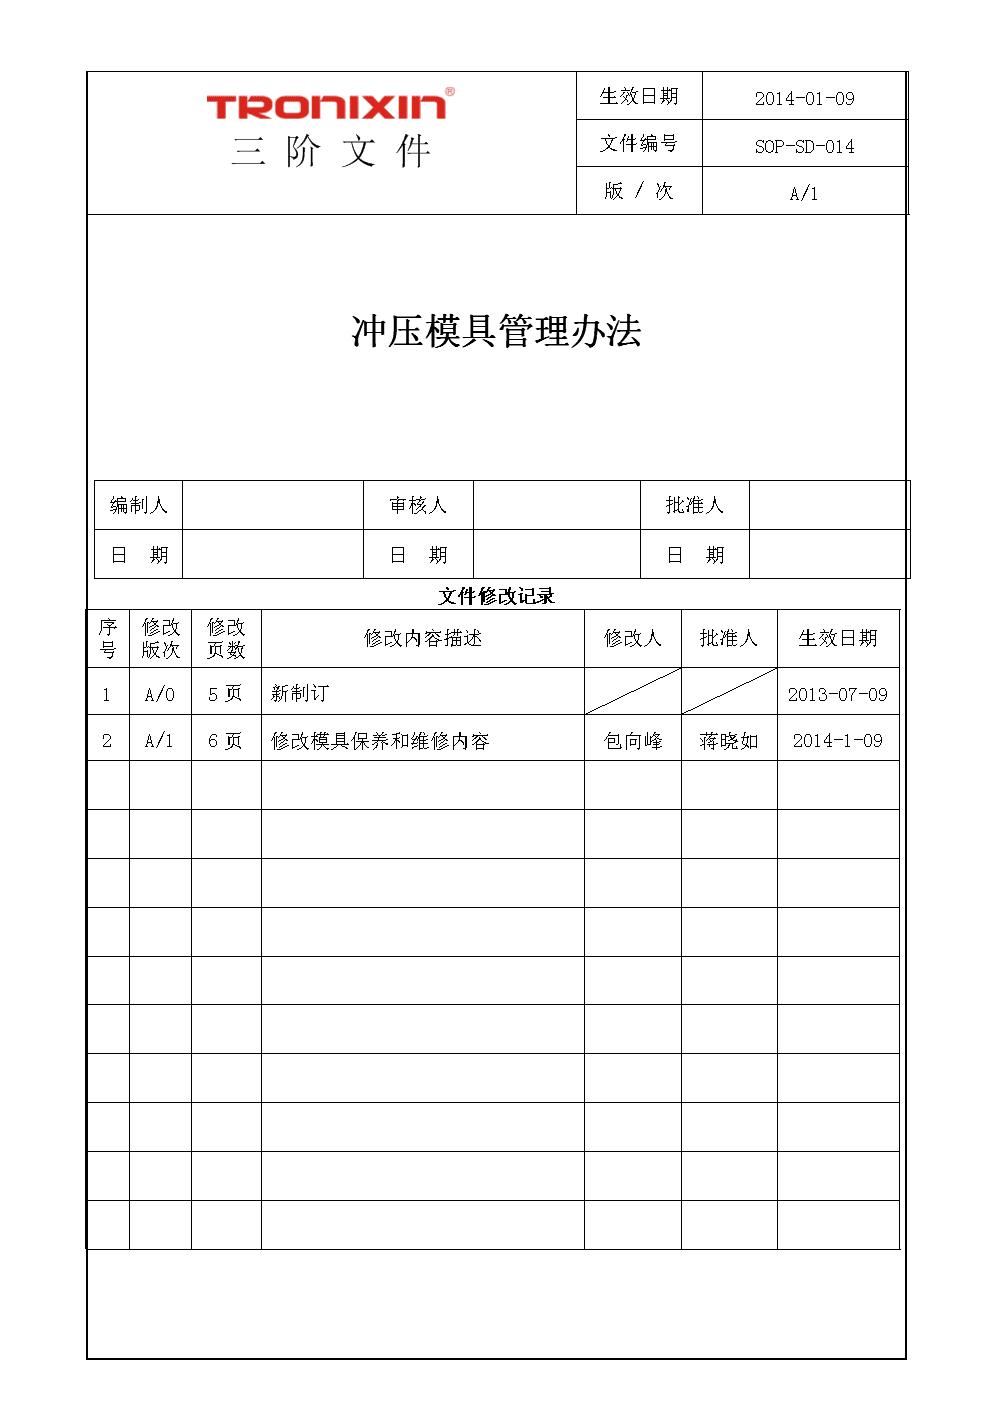 SOP-SD-014冲压模具管理办法 .doc